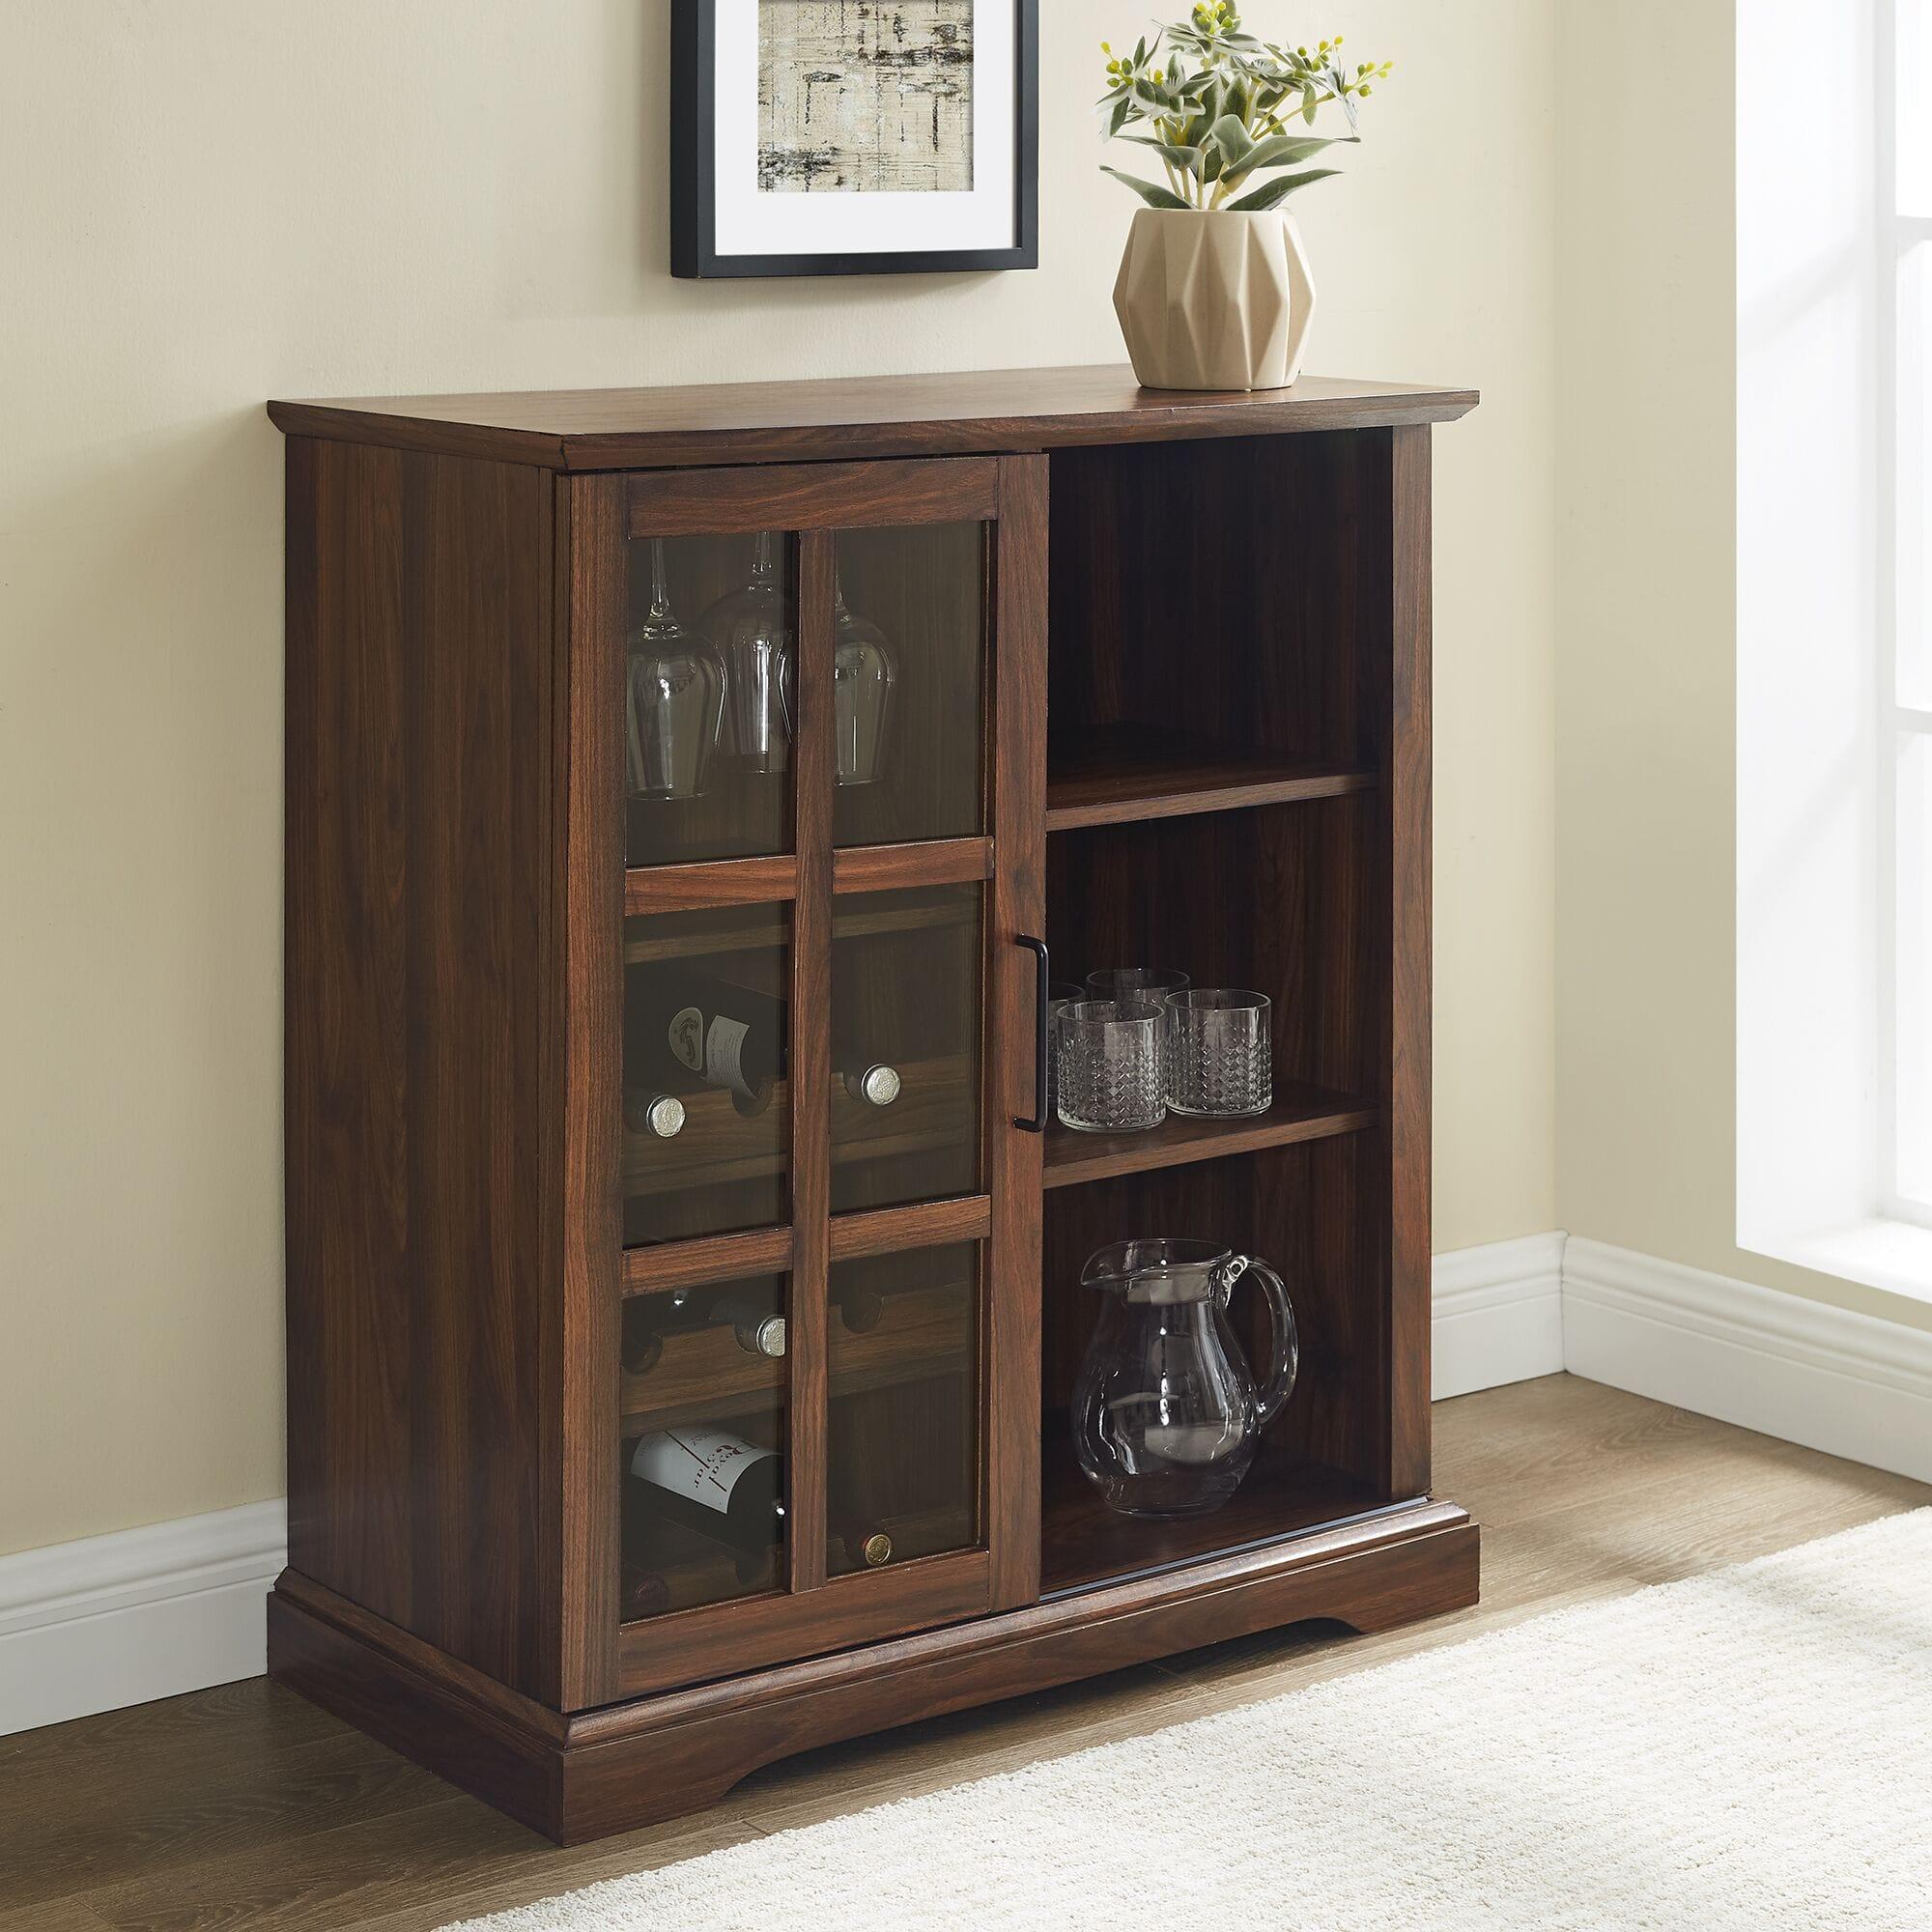 36 Inch Sliding Glass Door Bar Cabinet Dark Walnut By Walker Edison